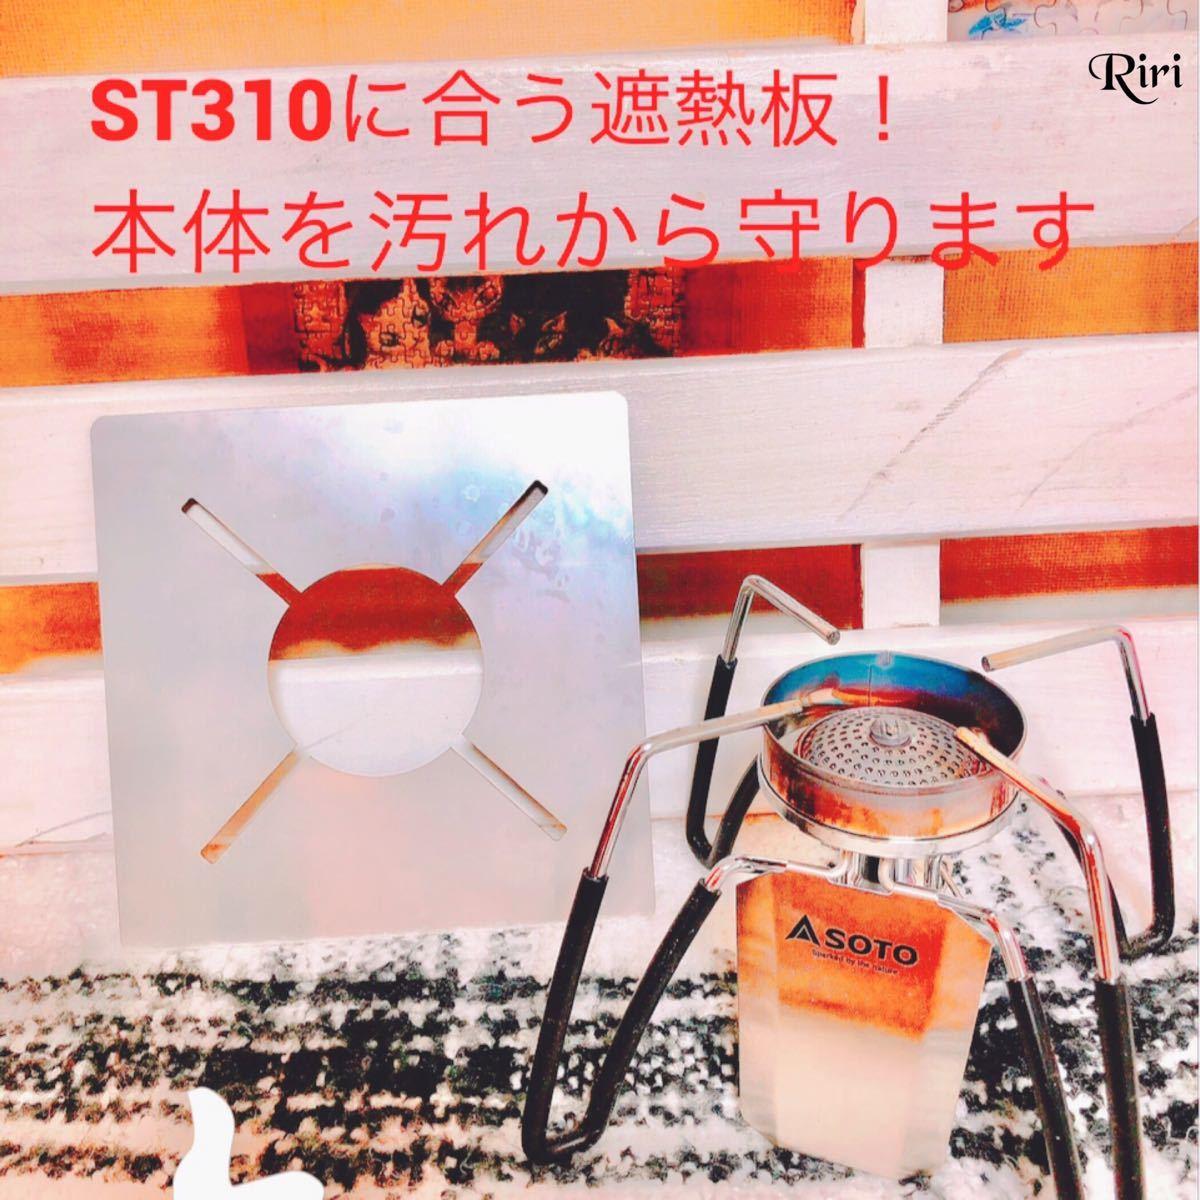 SOTO/遮熱板/ ST310/単品 シングルバーナー SOTO